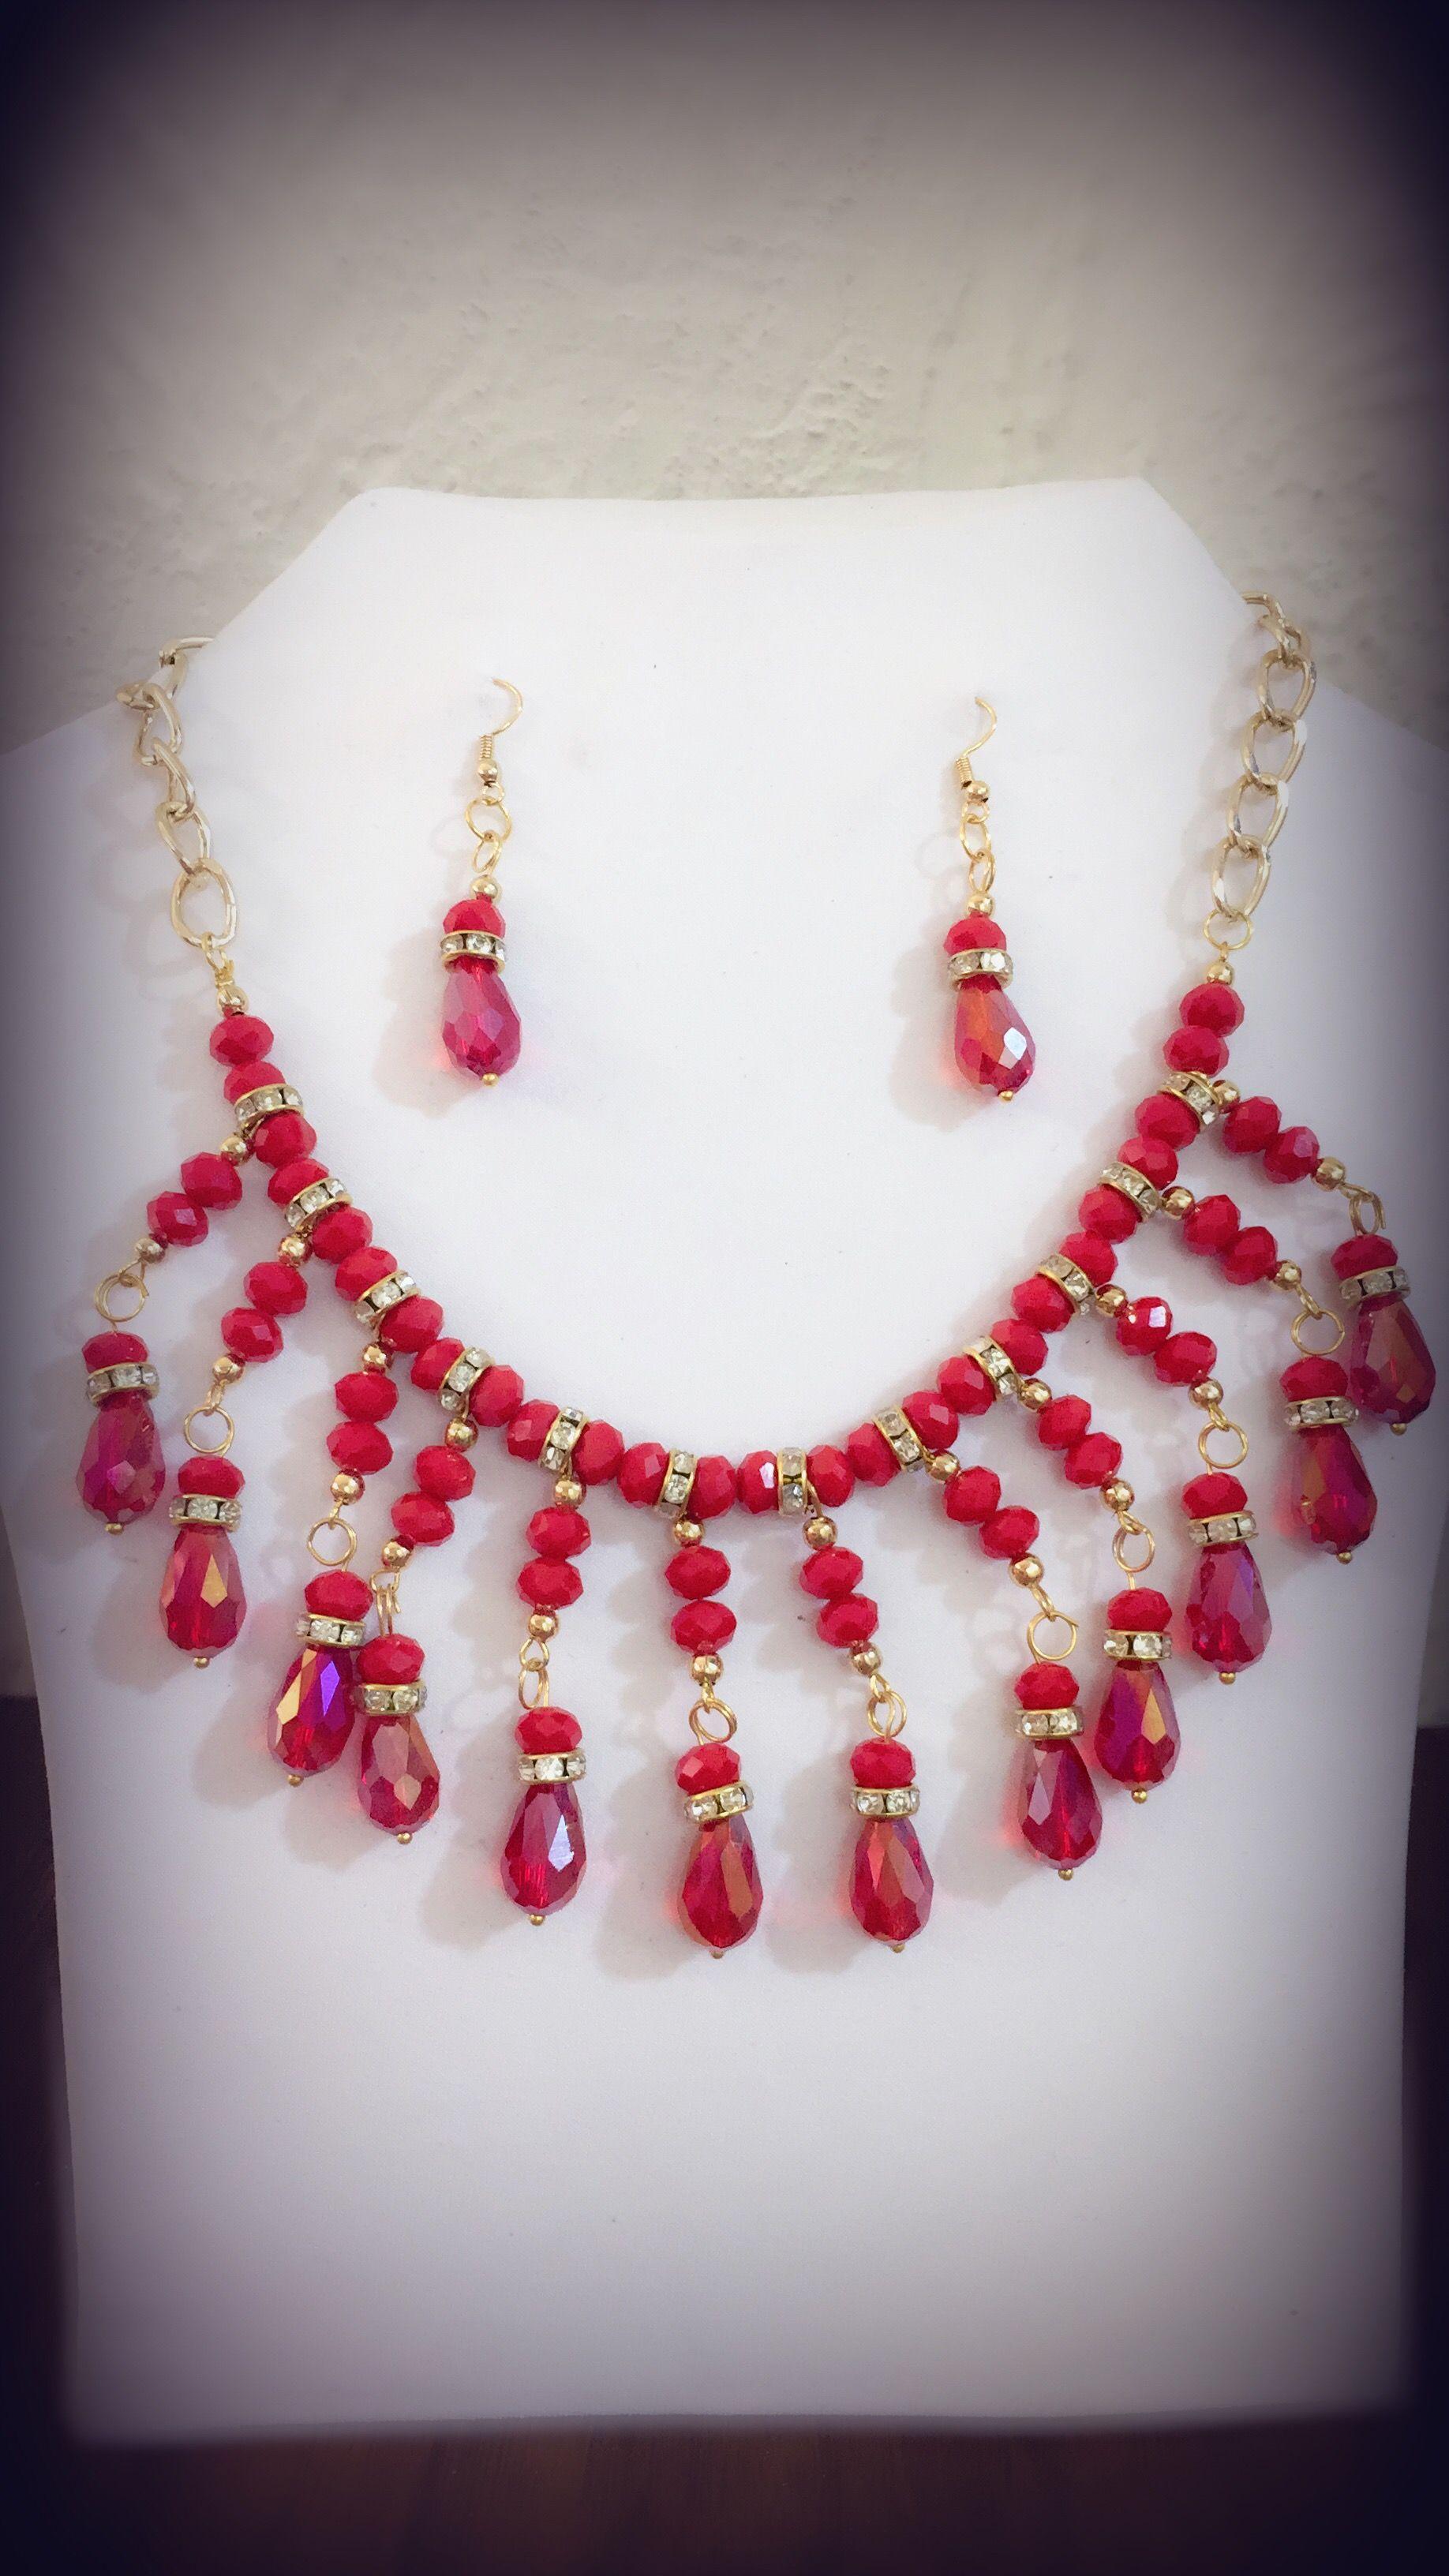 Ne /_ para mujer Vintage Gotas Colgante Gargantilla Collar Aretes Pulsera Set St